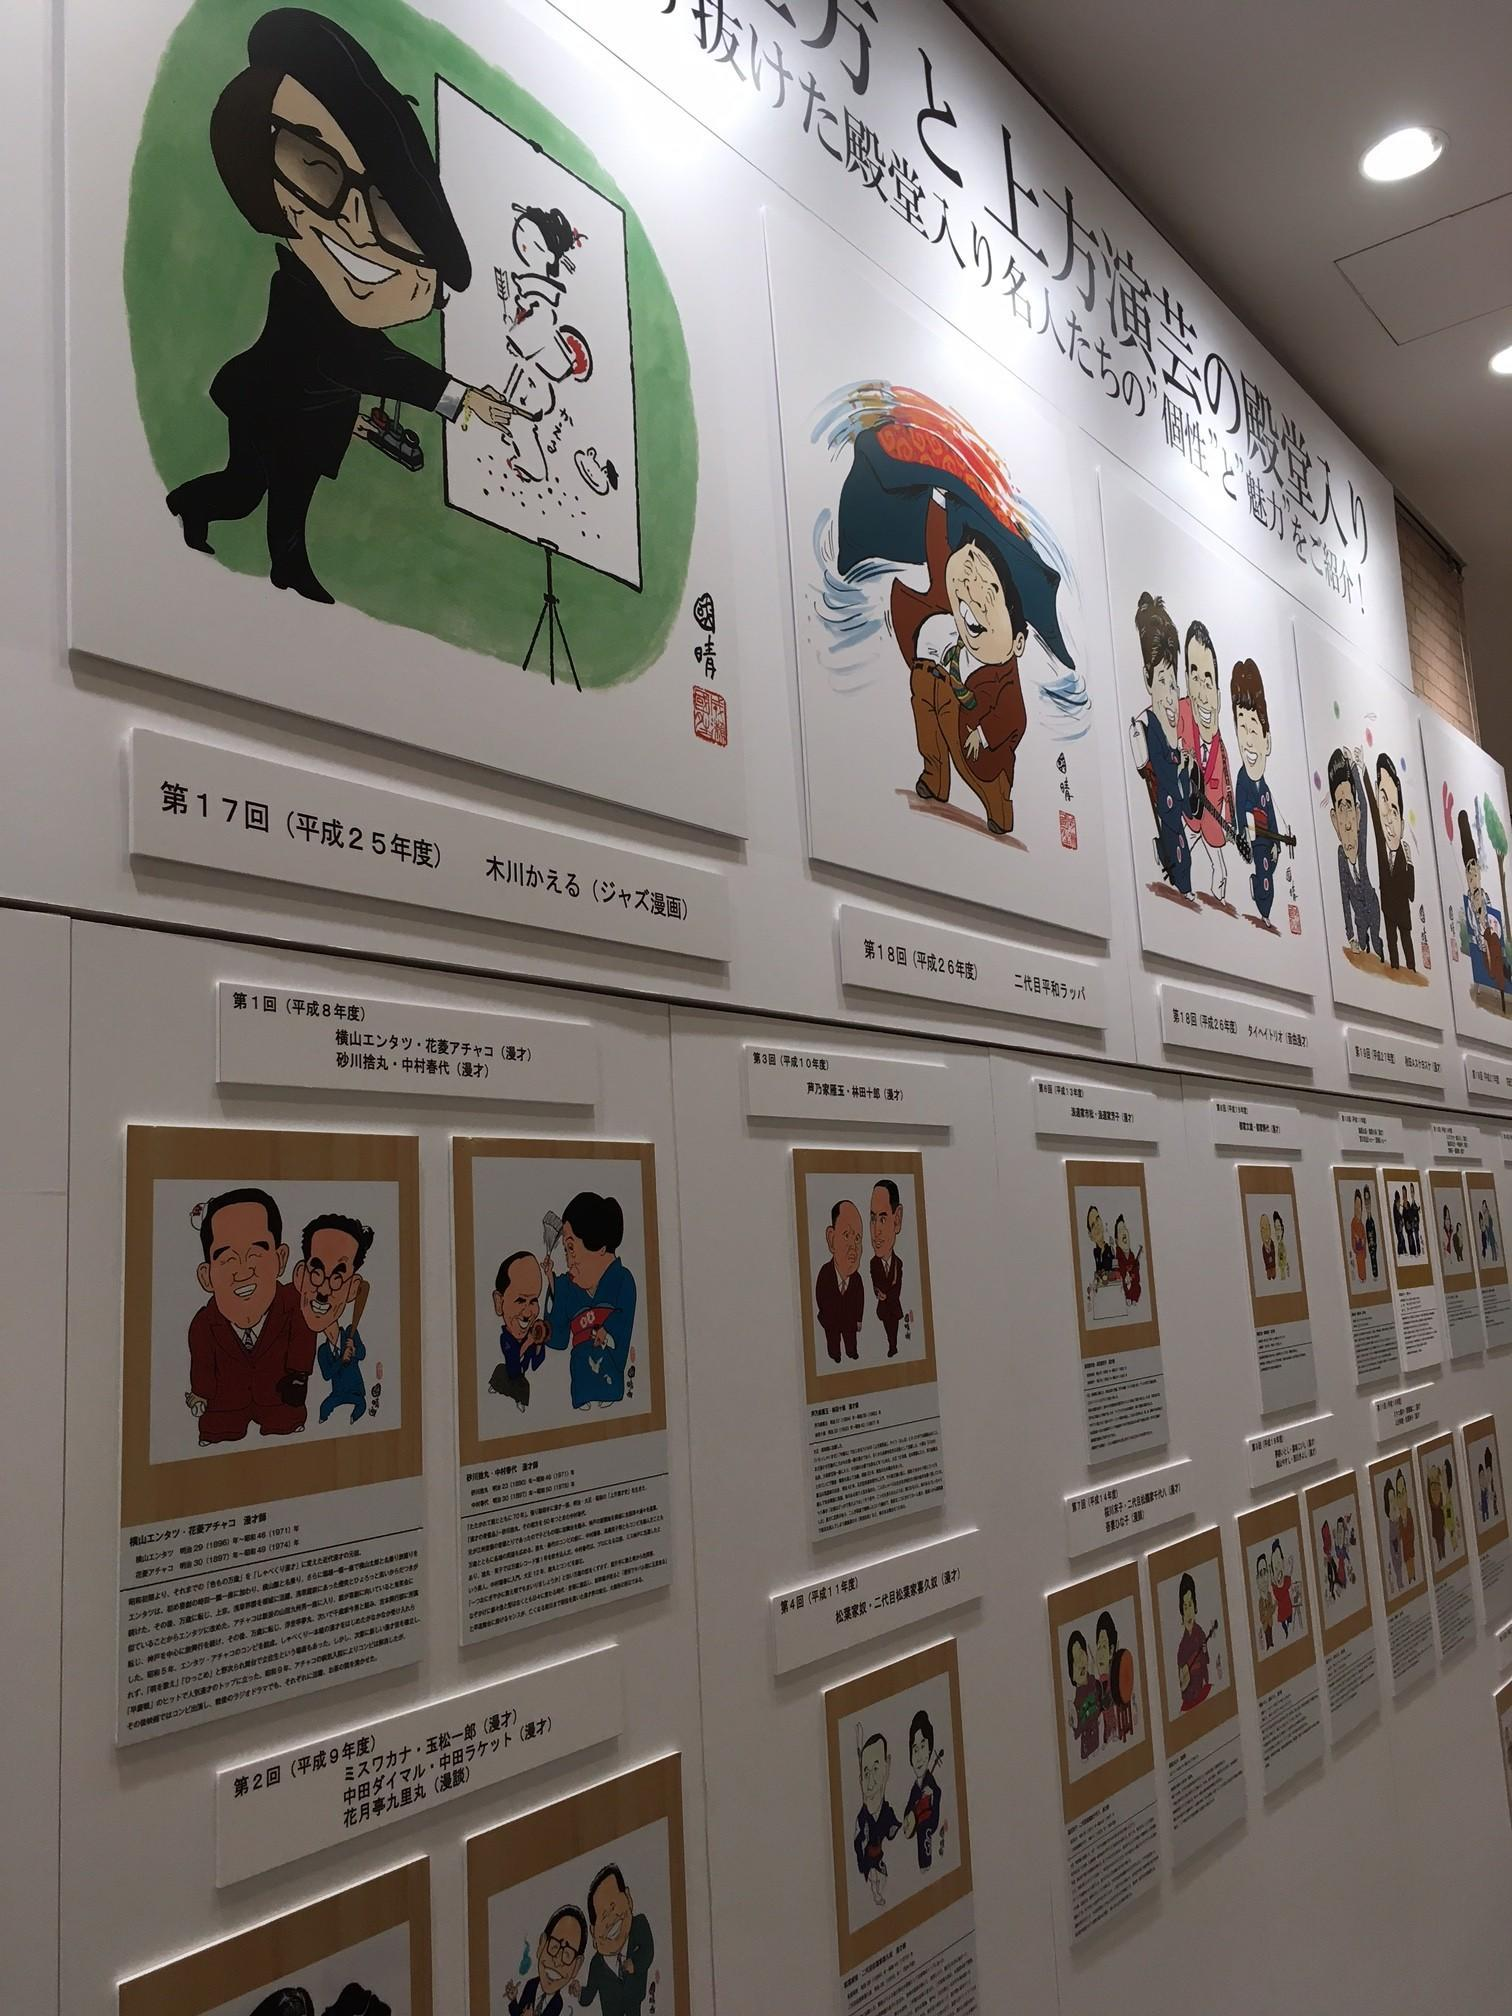 http://news.yoshimoto.co.jp/20161226181444-20541ce31cdac257edf601cf7ae79ef770e98002.jpg